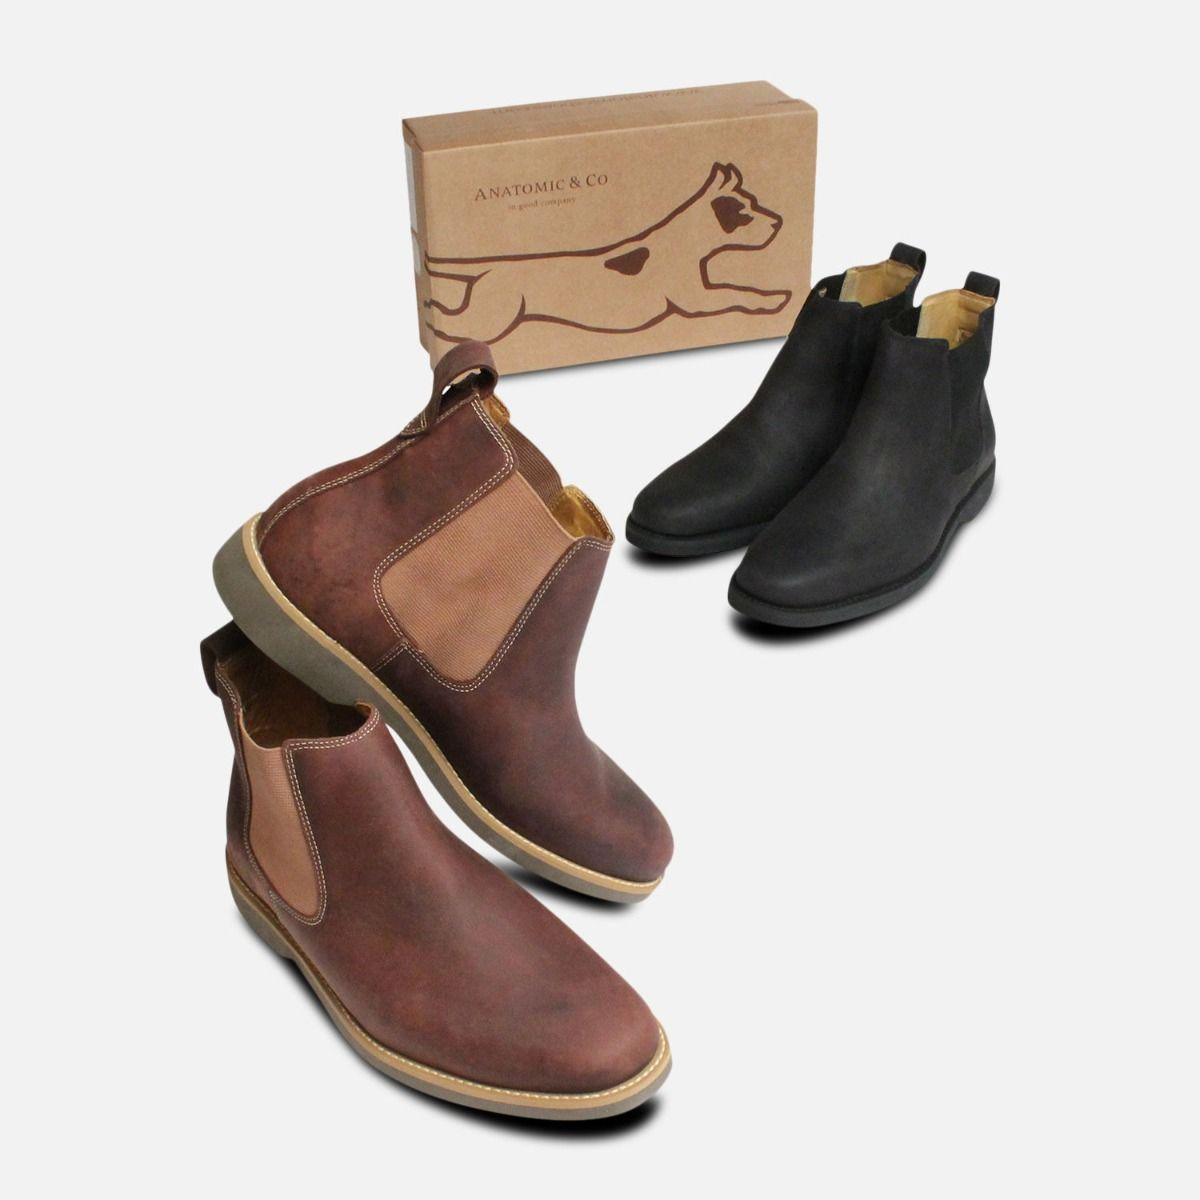 Matt Black Mustang Chelsea Boots Anatomic & Co